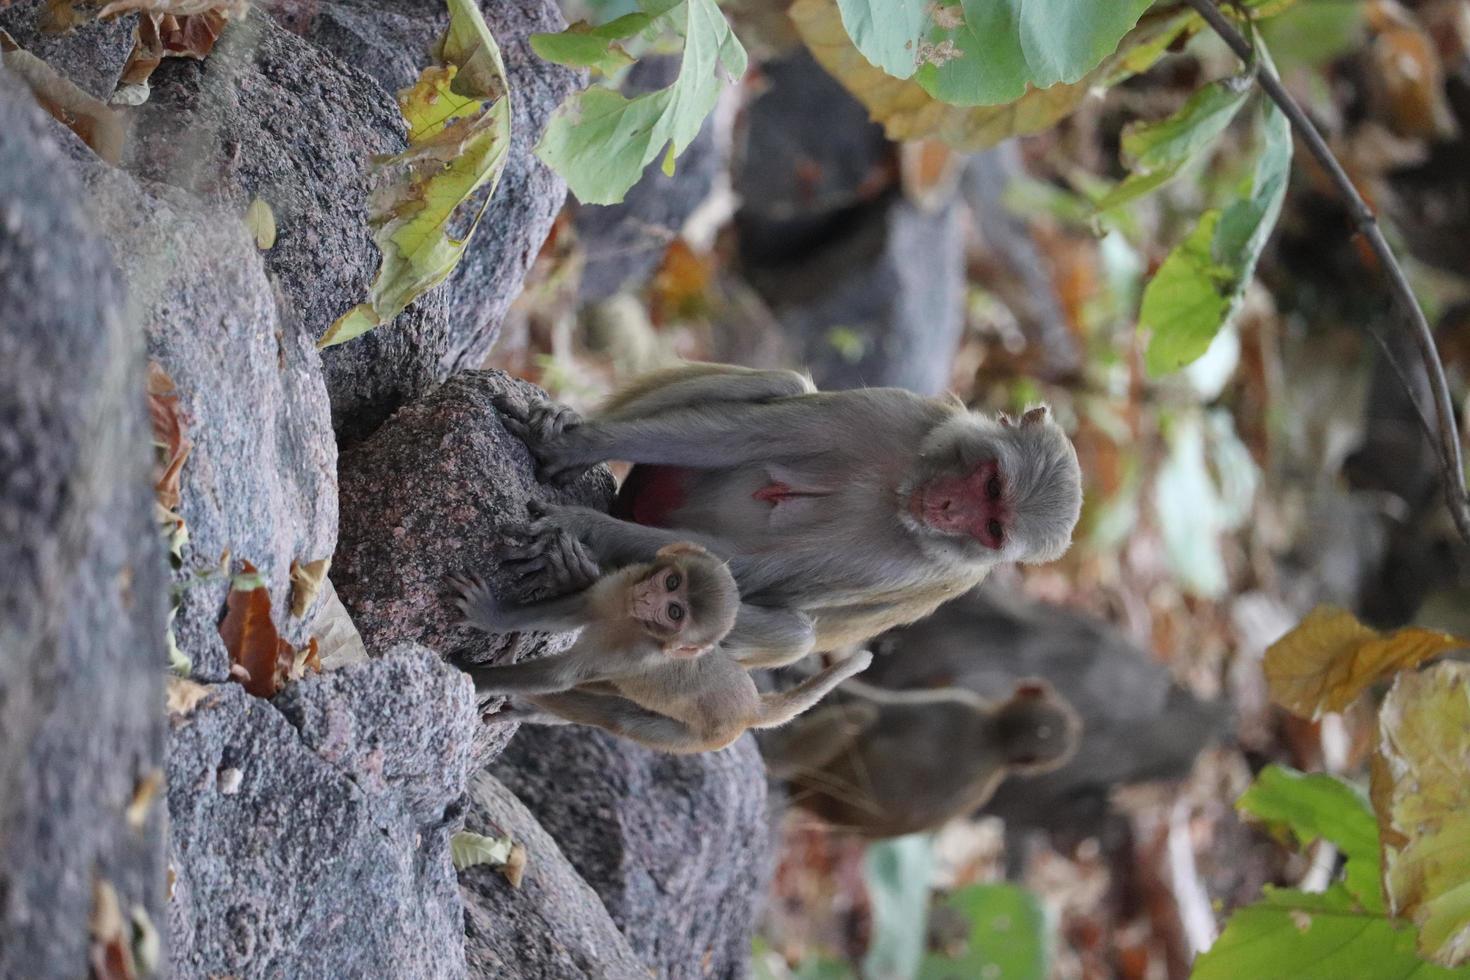 Adult and baby monkeys photo